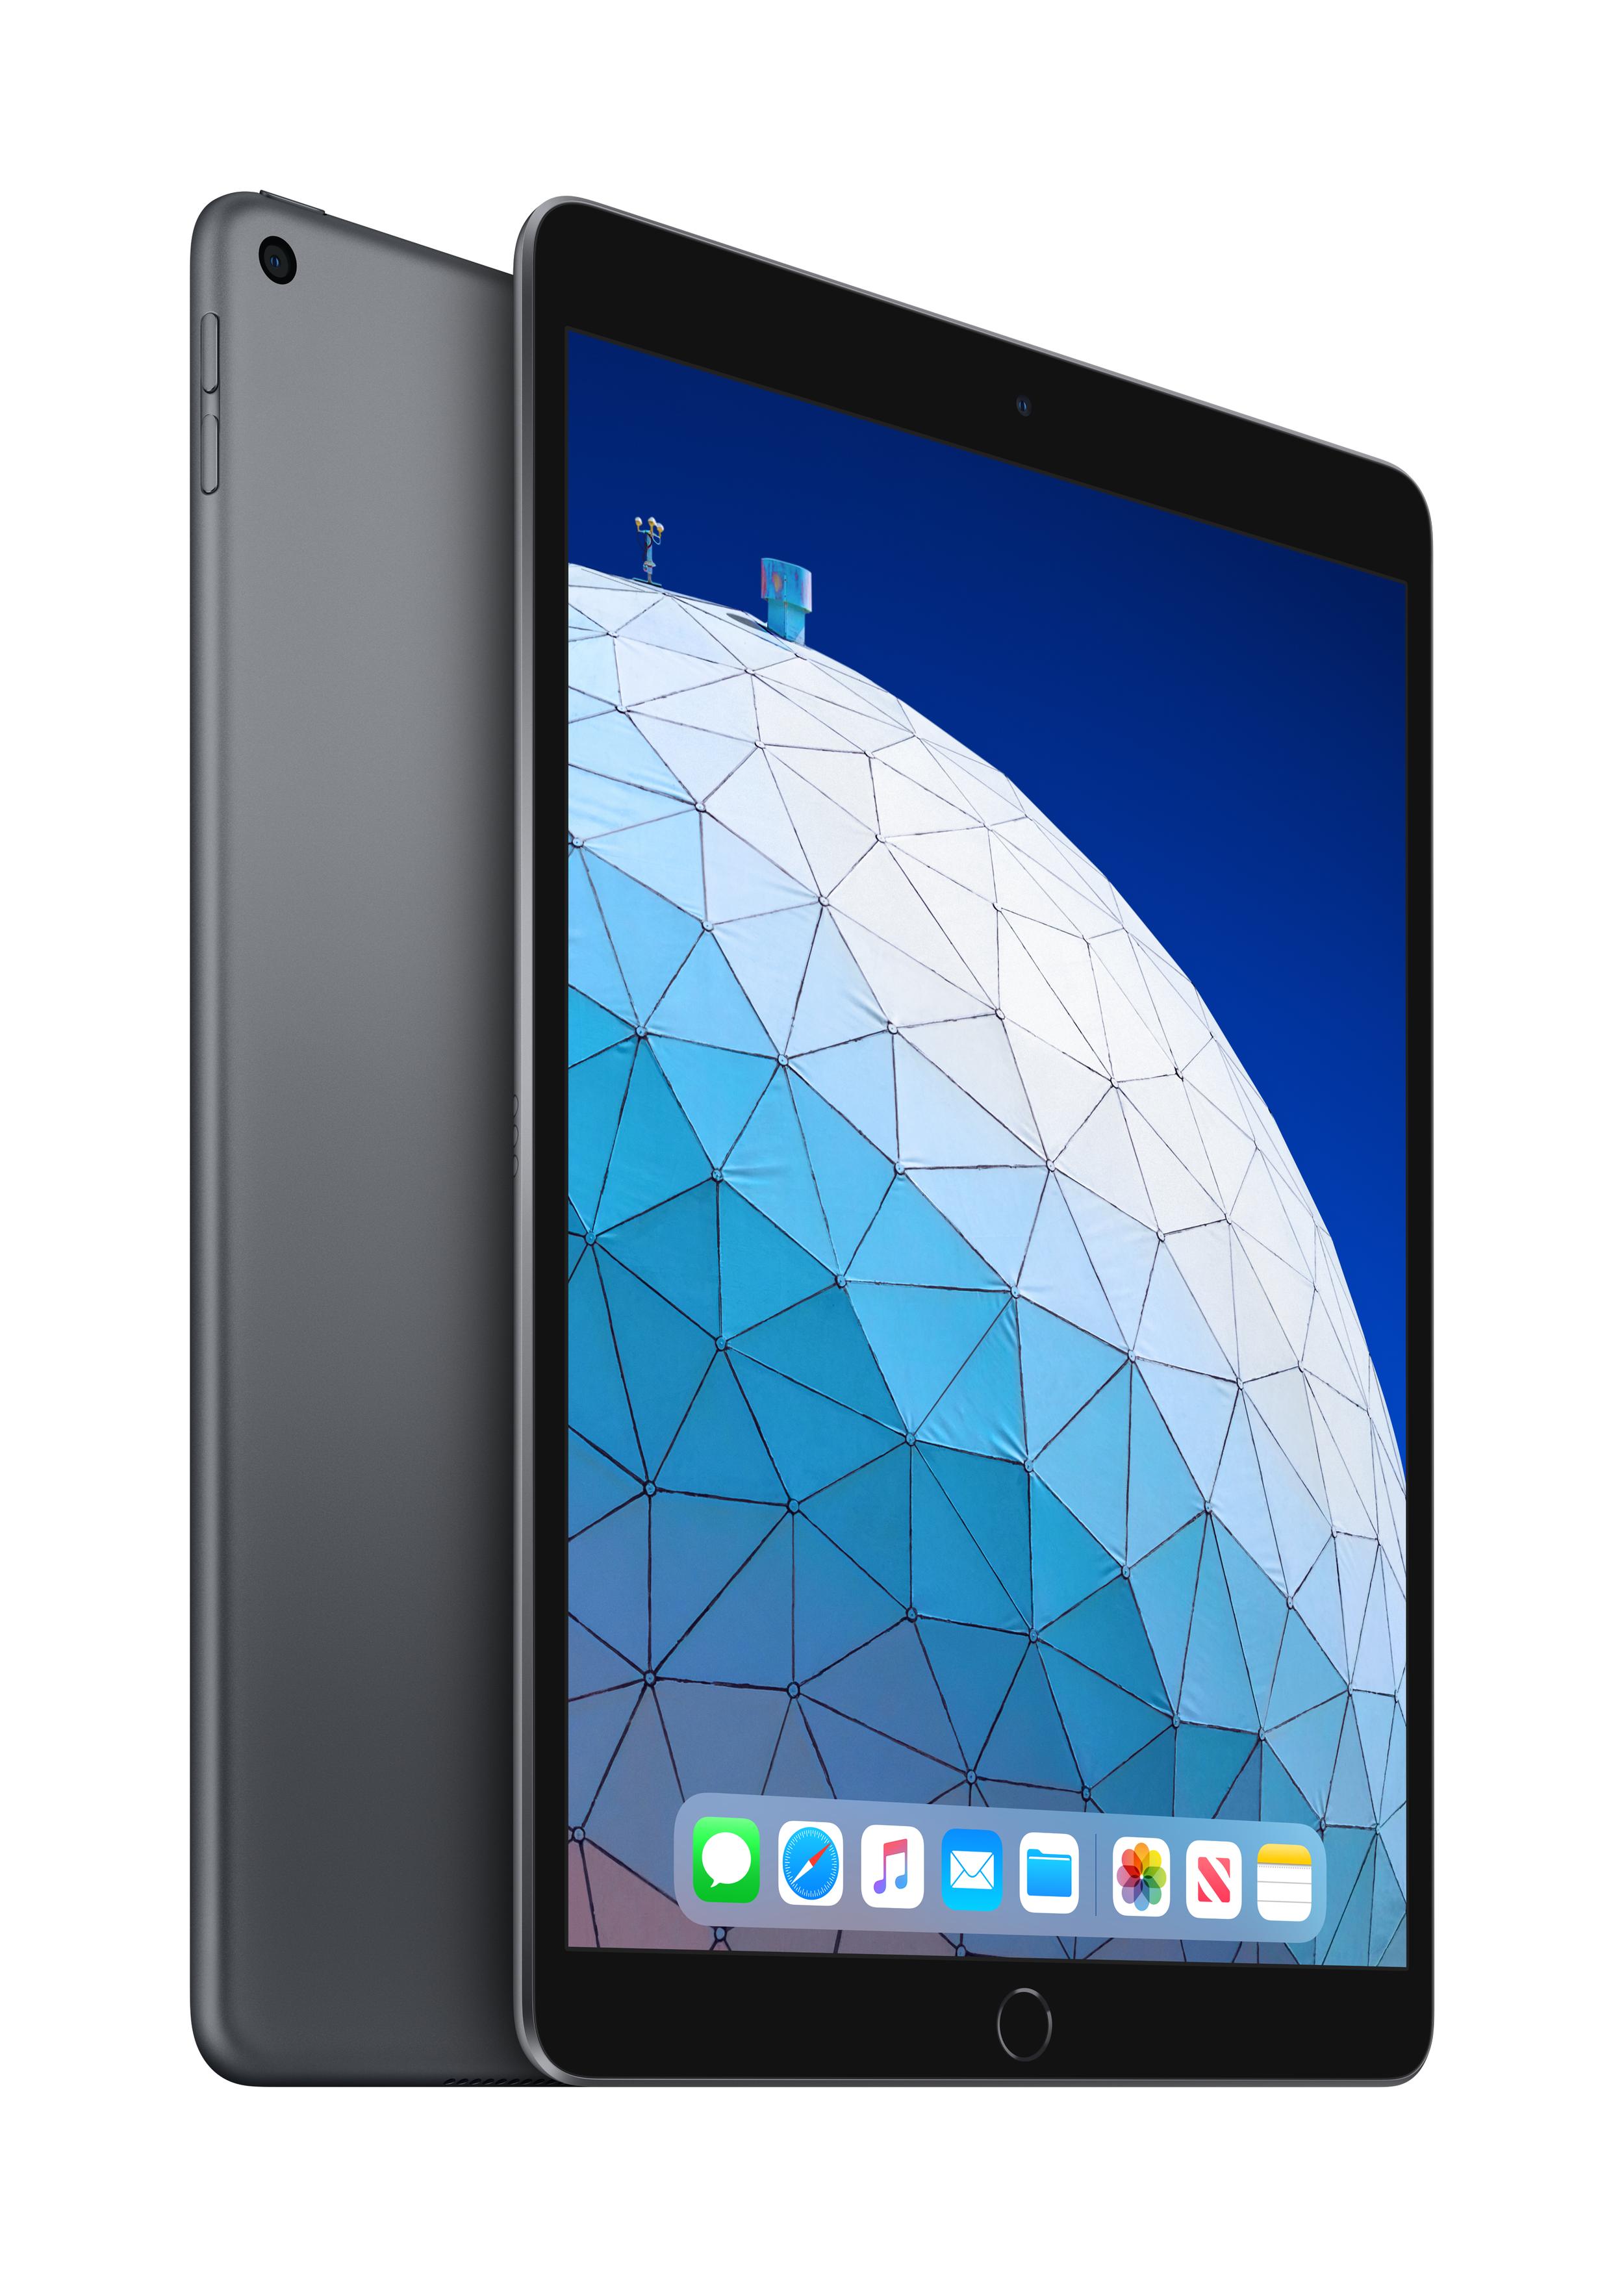 iPad_Air_Space_Gray_2-Up_US-EN_SCREEN.png